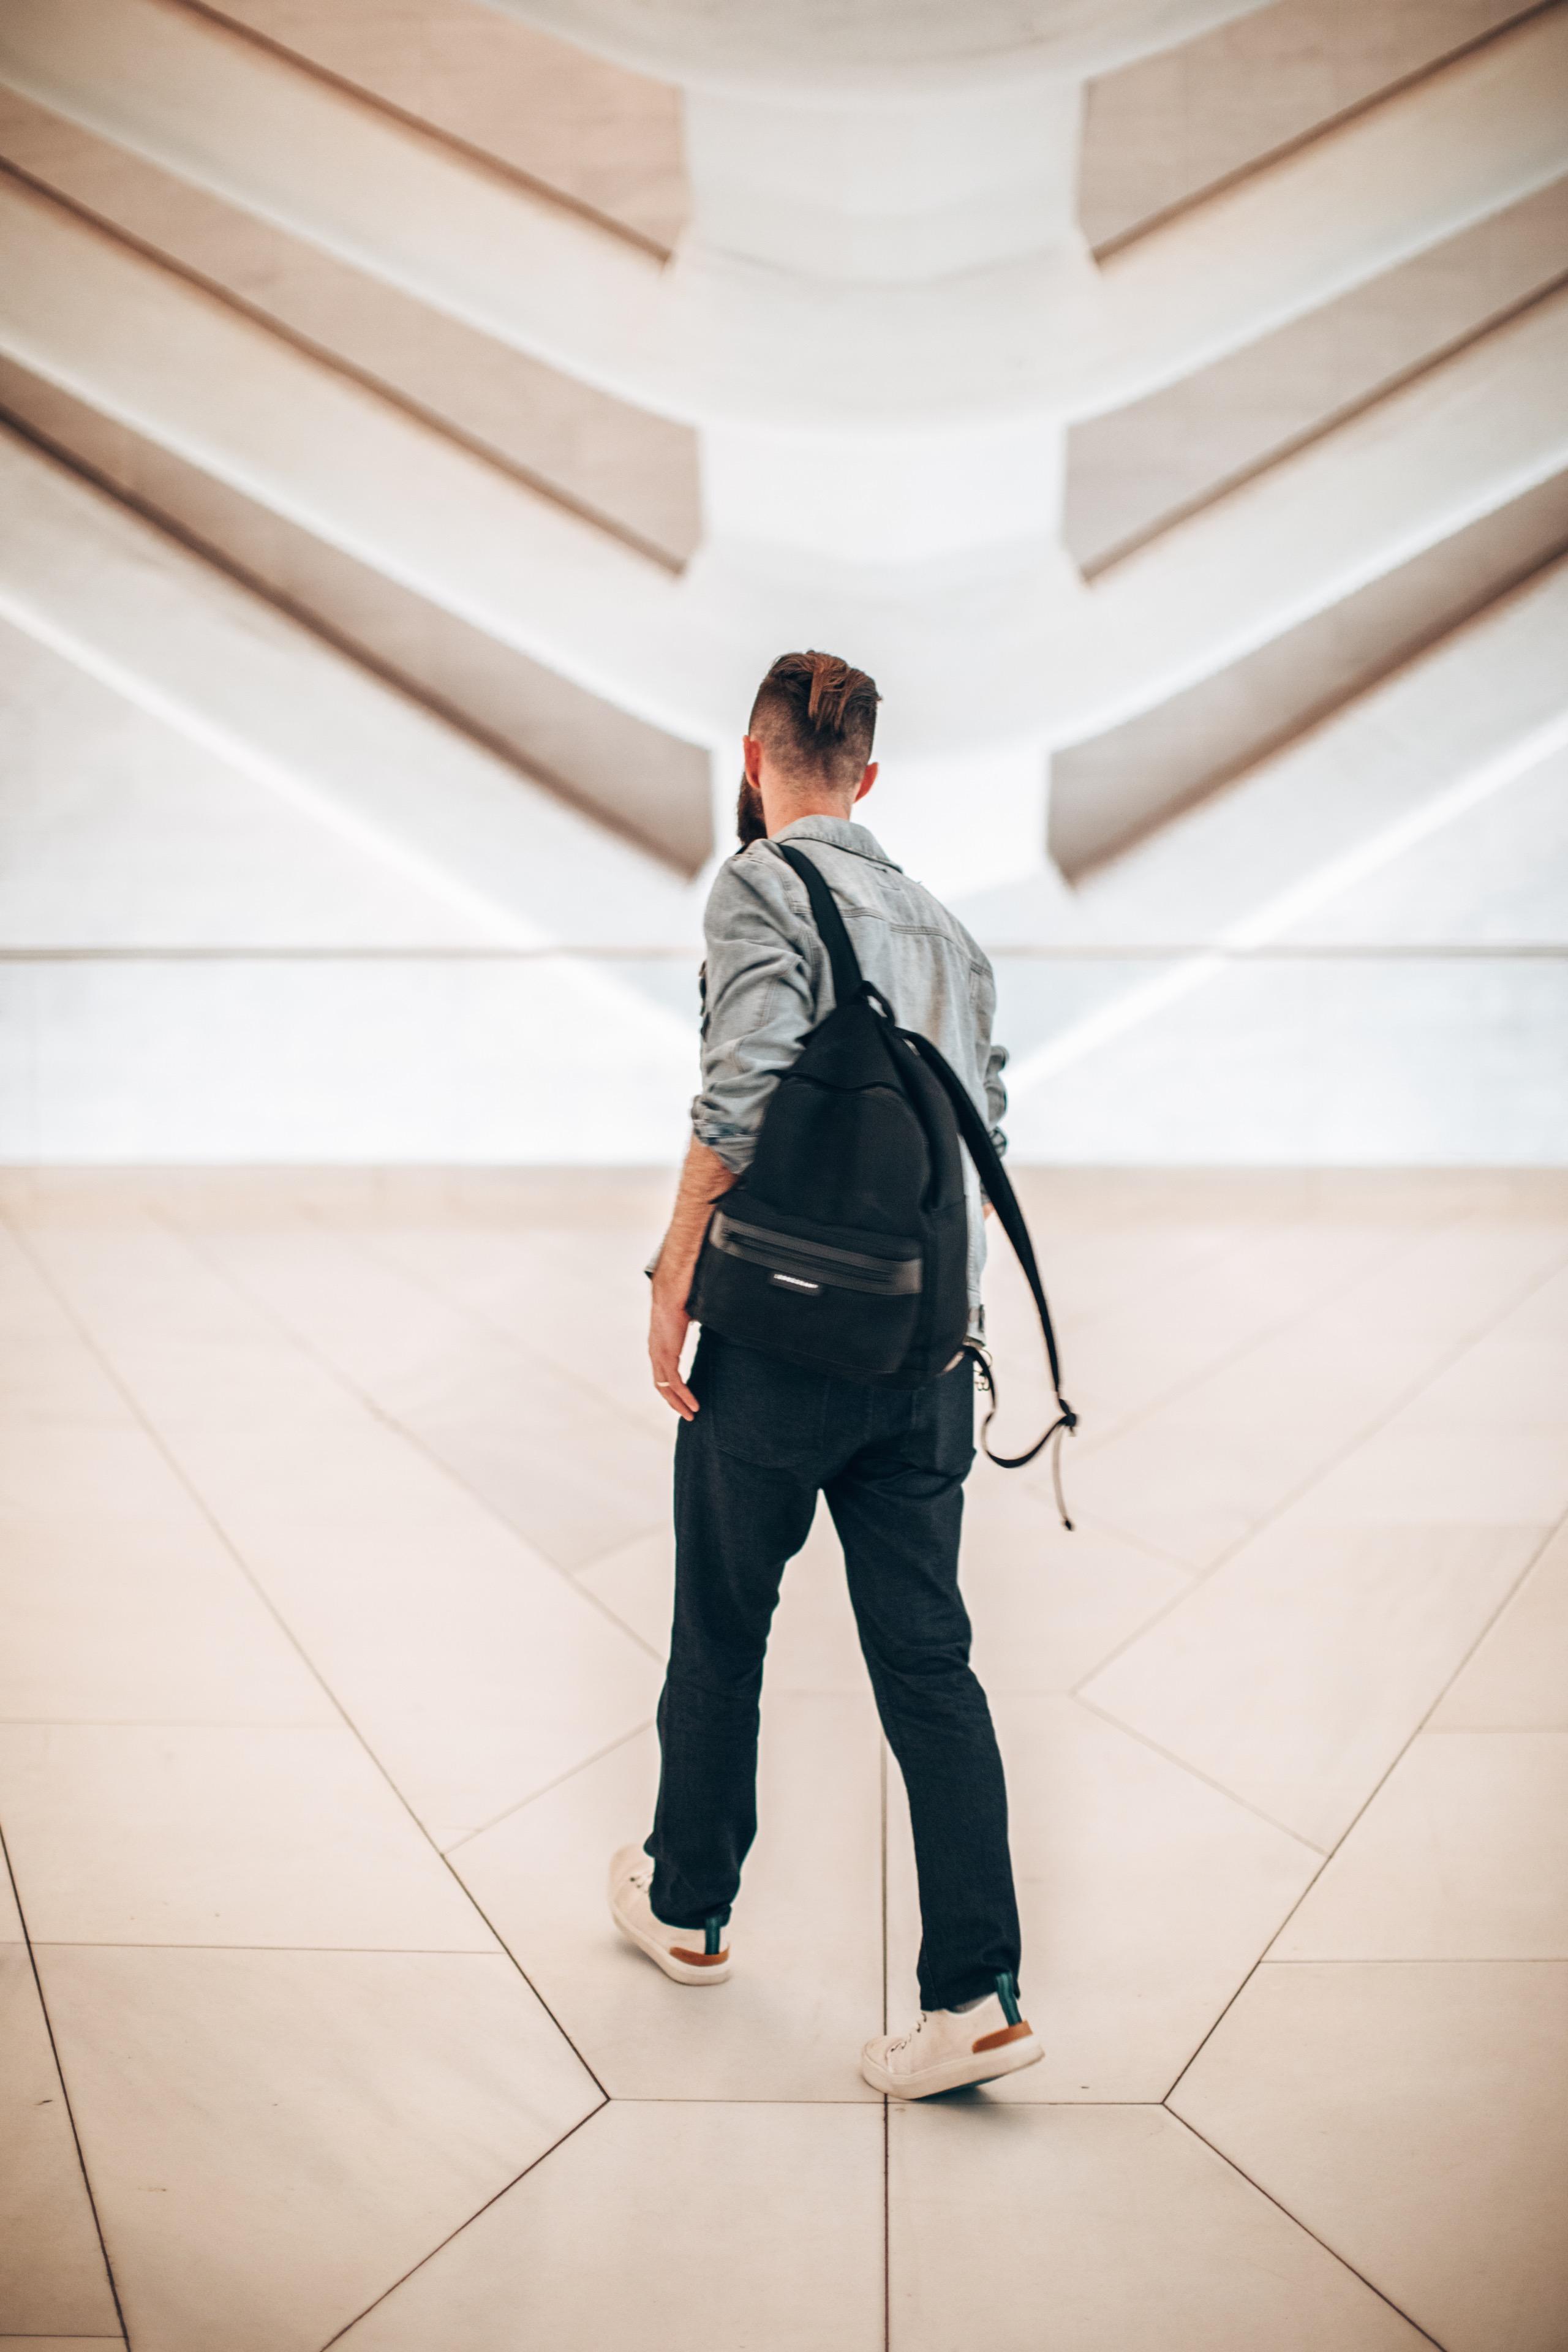 man walking away in the Oculus building in NYC